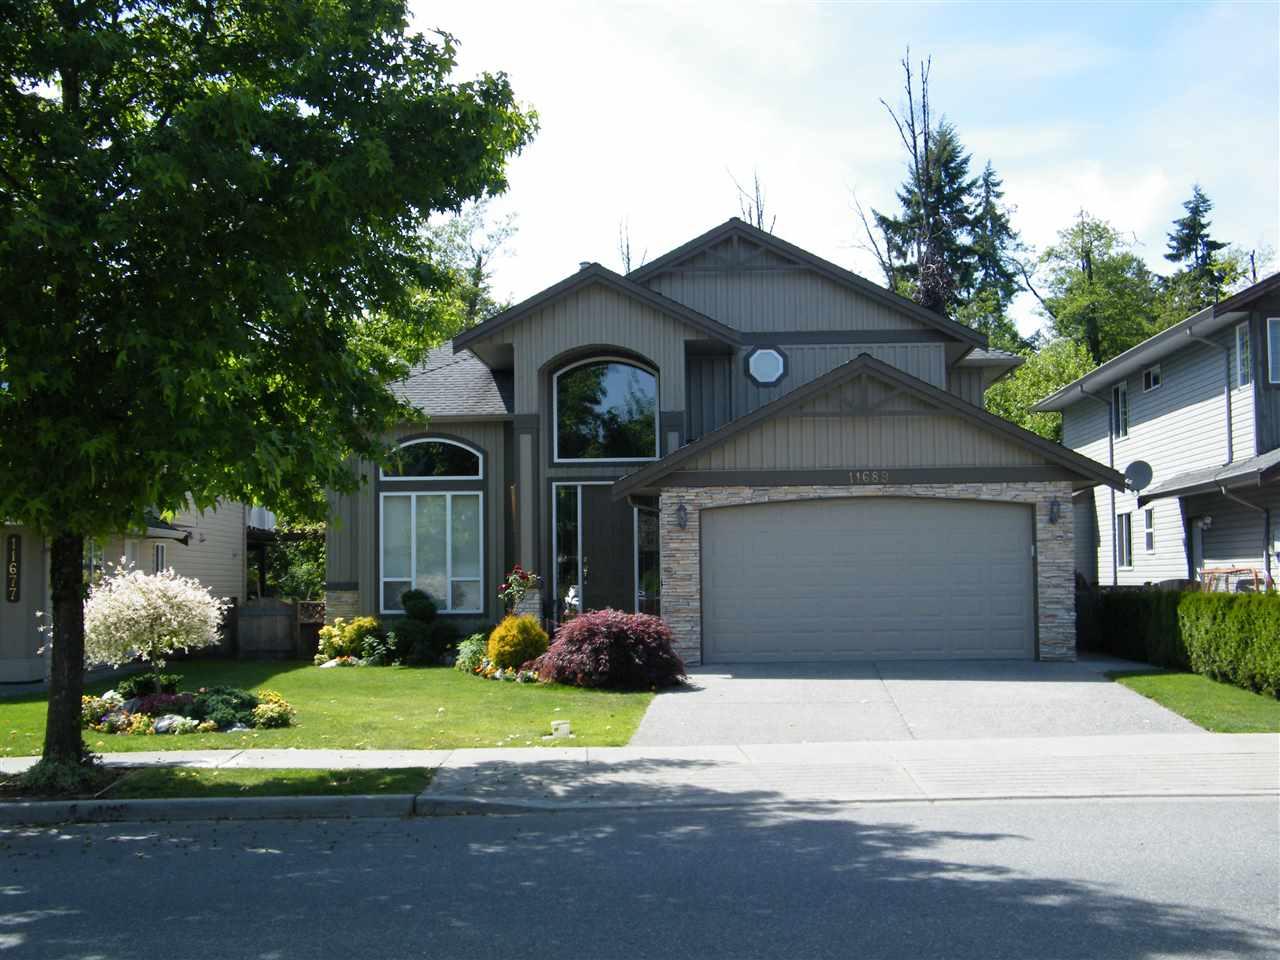 11689 Creekside Street In Maple Ridge Cottonwood Mr House